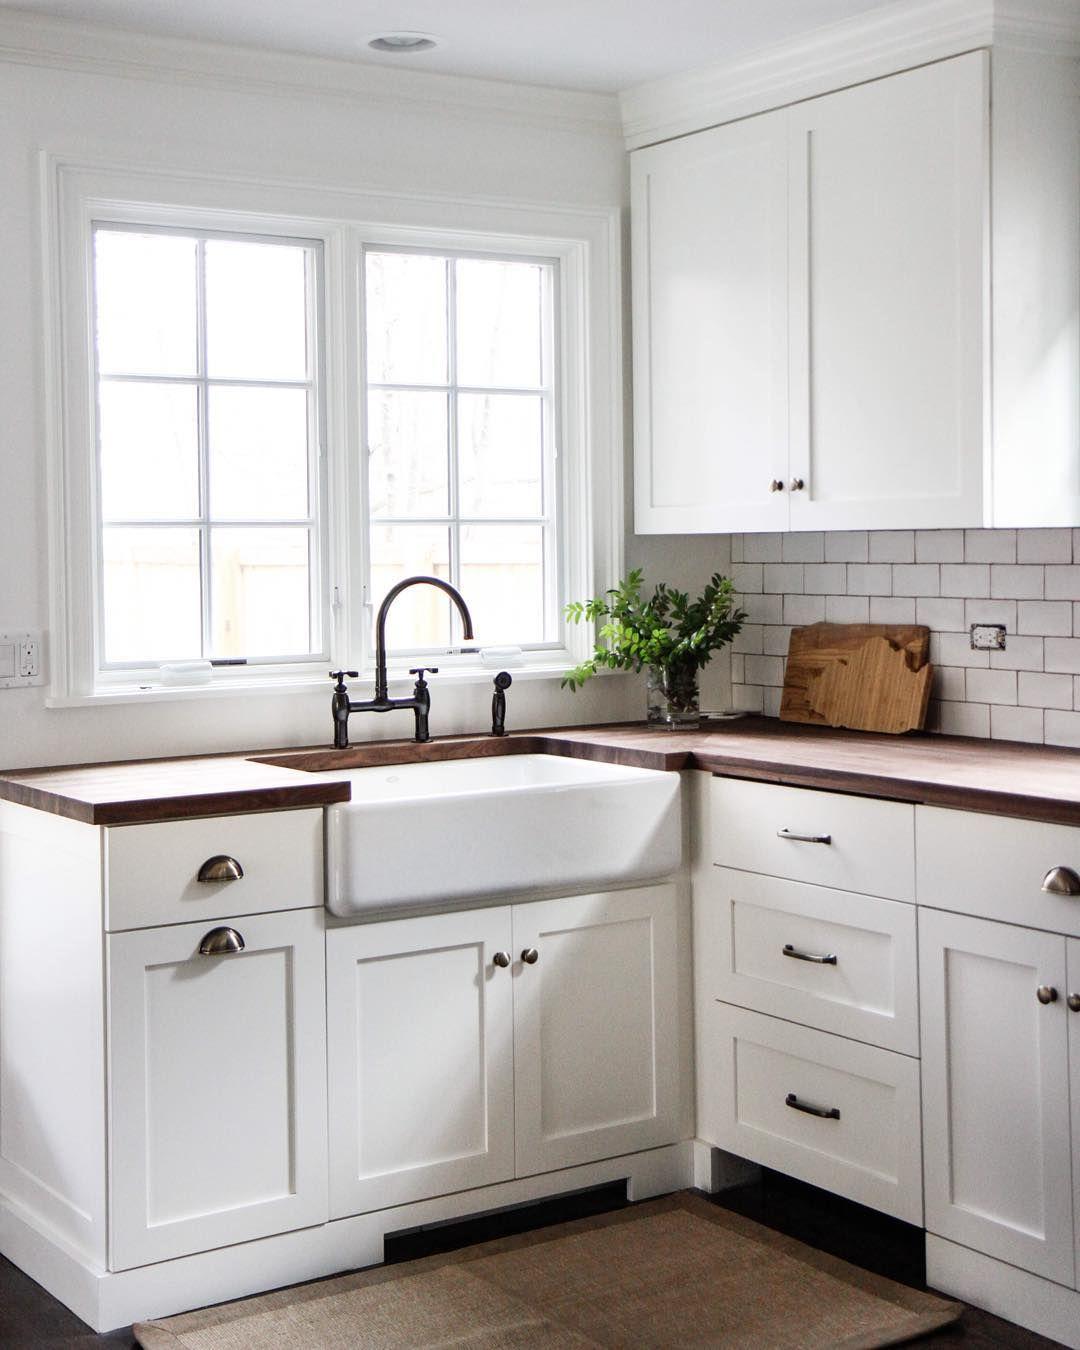 sink kitchen cabinets island cart target butcher block counters white subway tile farmhouse hardware